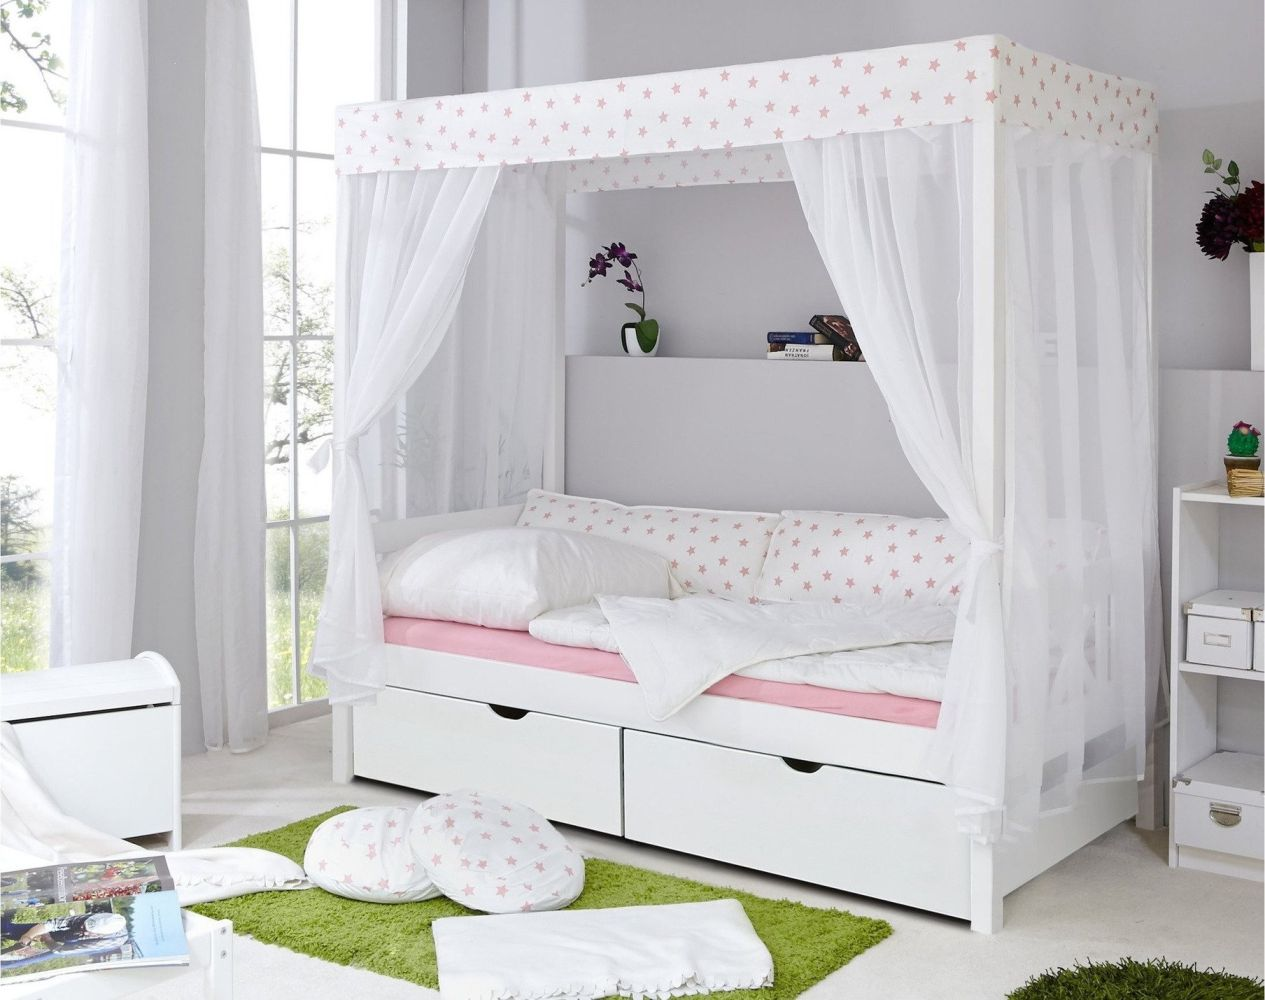 Ticaa 'Weiß-Rosa' Himmelbett 310 Kiefer Weiß inkl. Bettkasten 'Melanie' 90x200 Bild 1